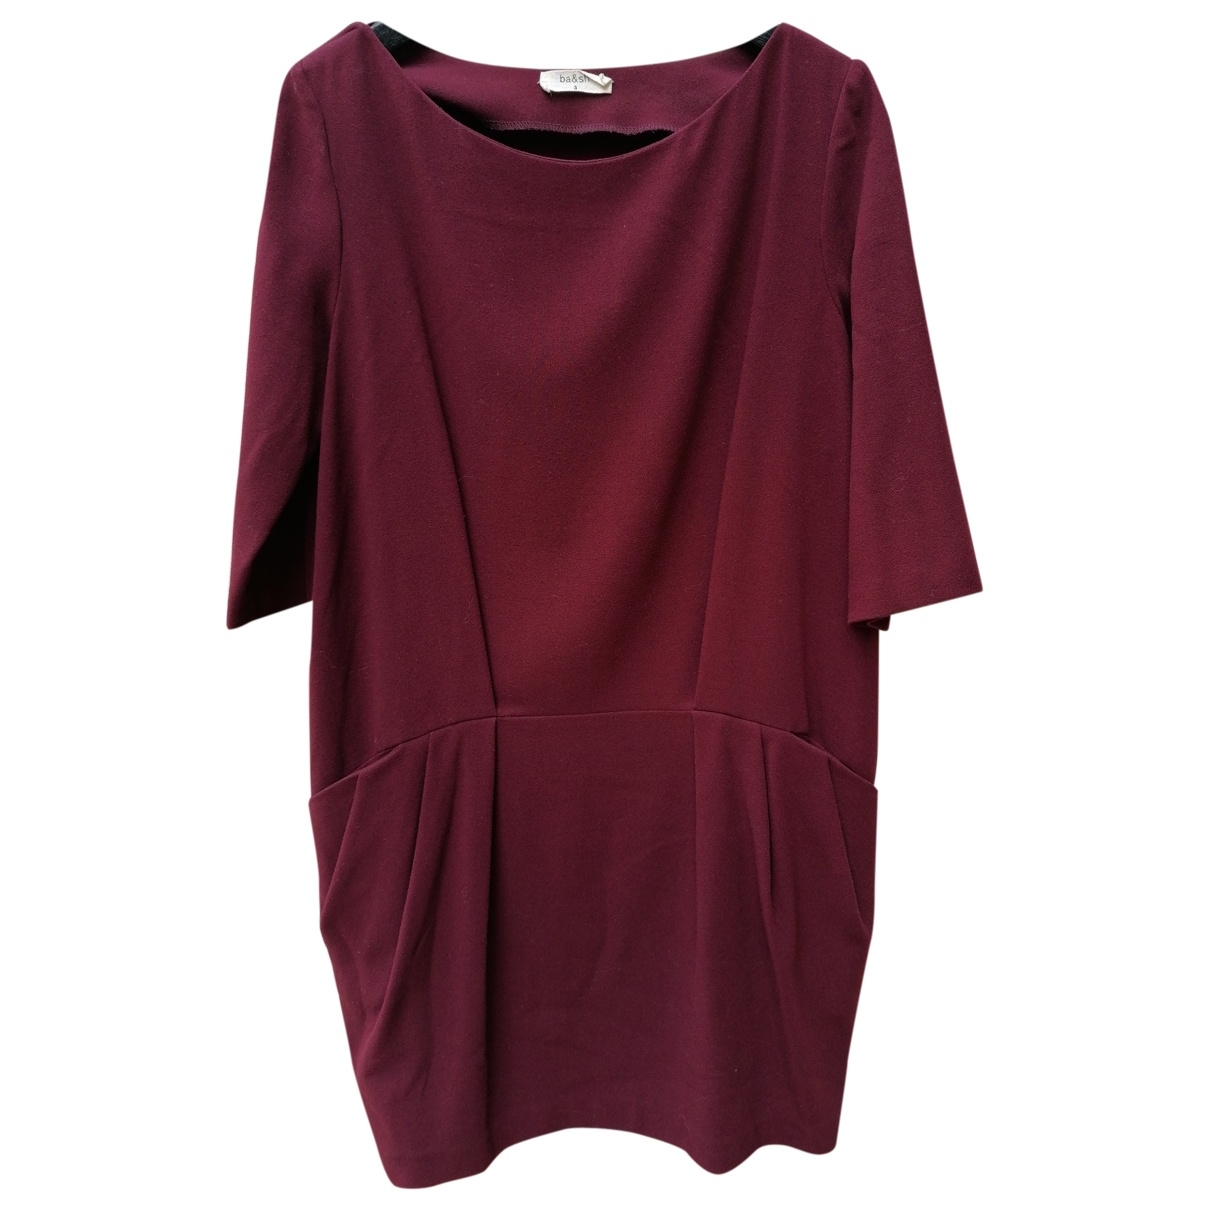 Ba&sh \N Burgundy Wool dress for Women 3 0-5